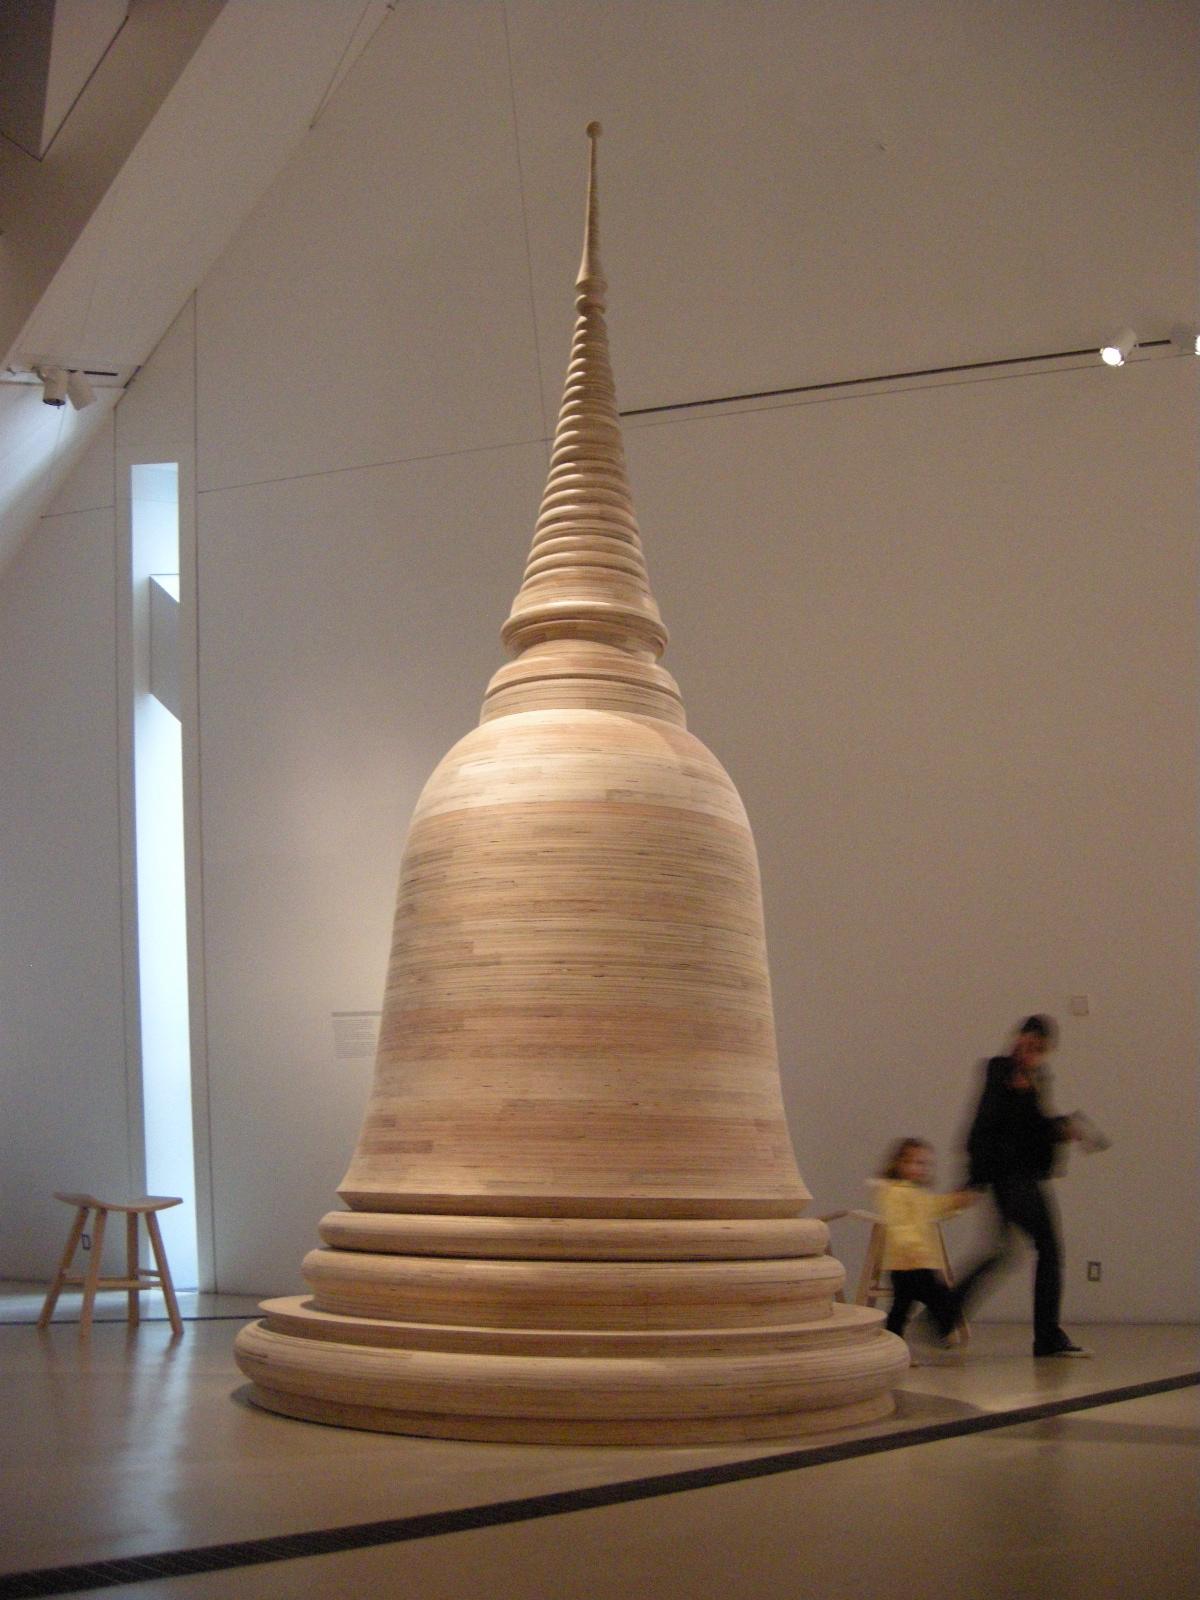 023 - stupa for observance and memorial exhibit.JPG